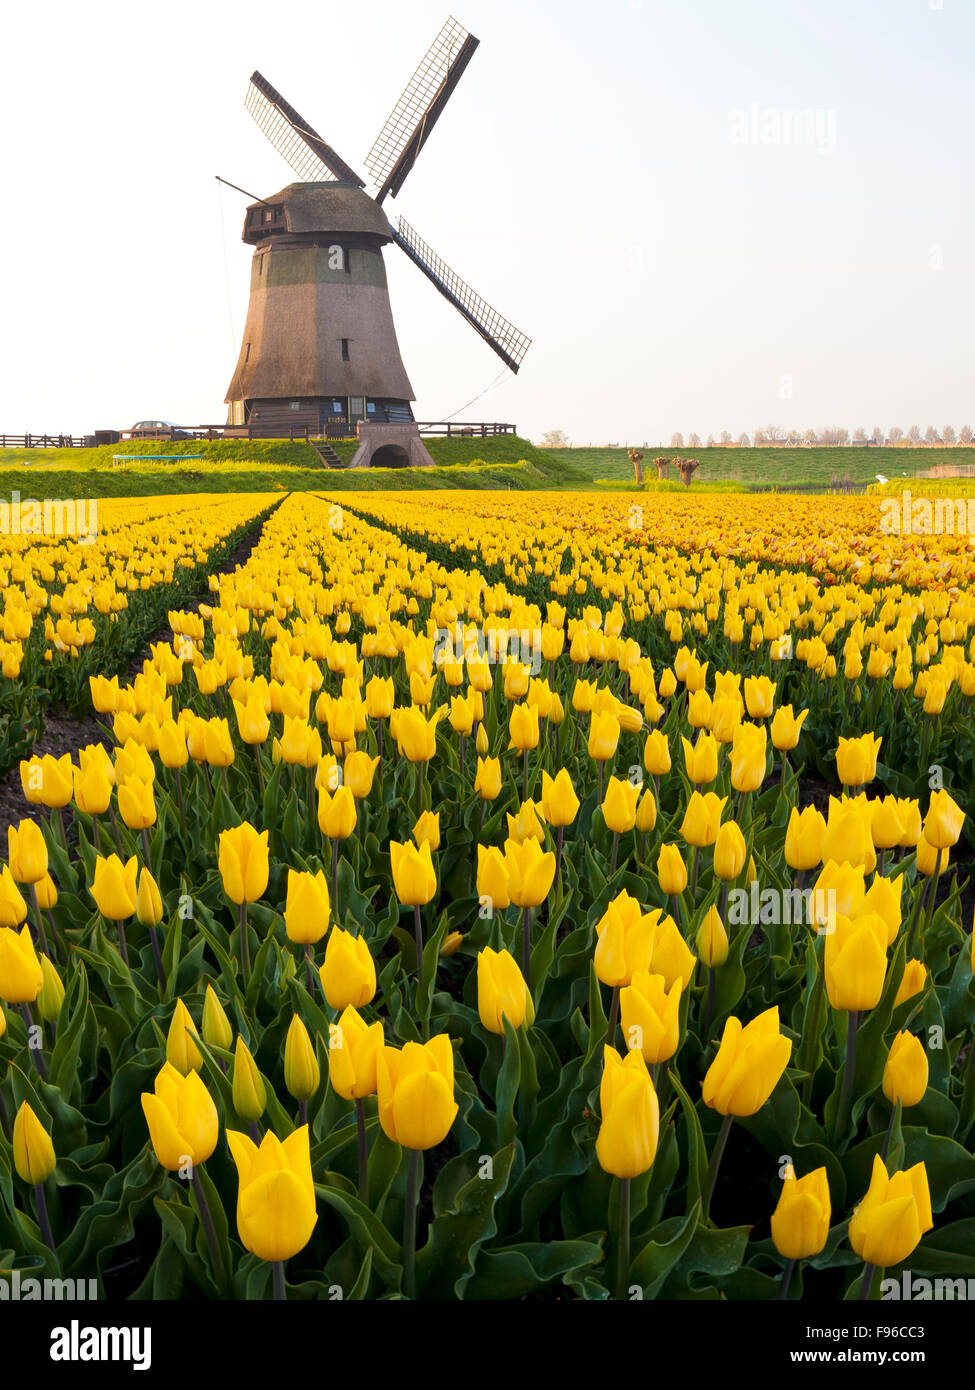 Windmill and Tulip Field near Schermerhorn, North Holland, Netherlands - Stock Image